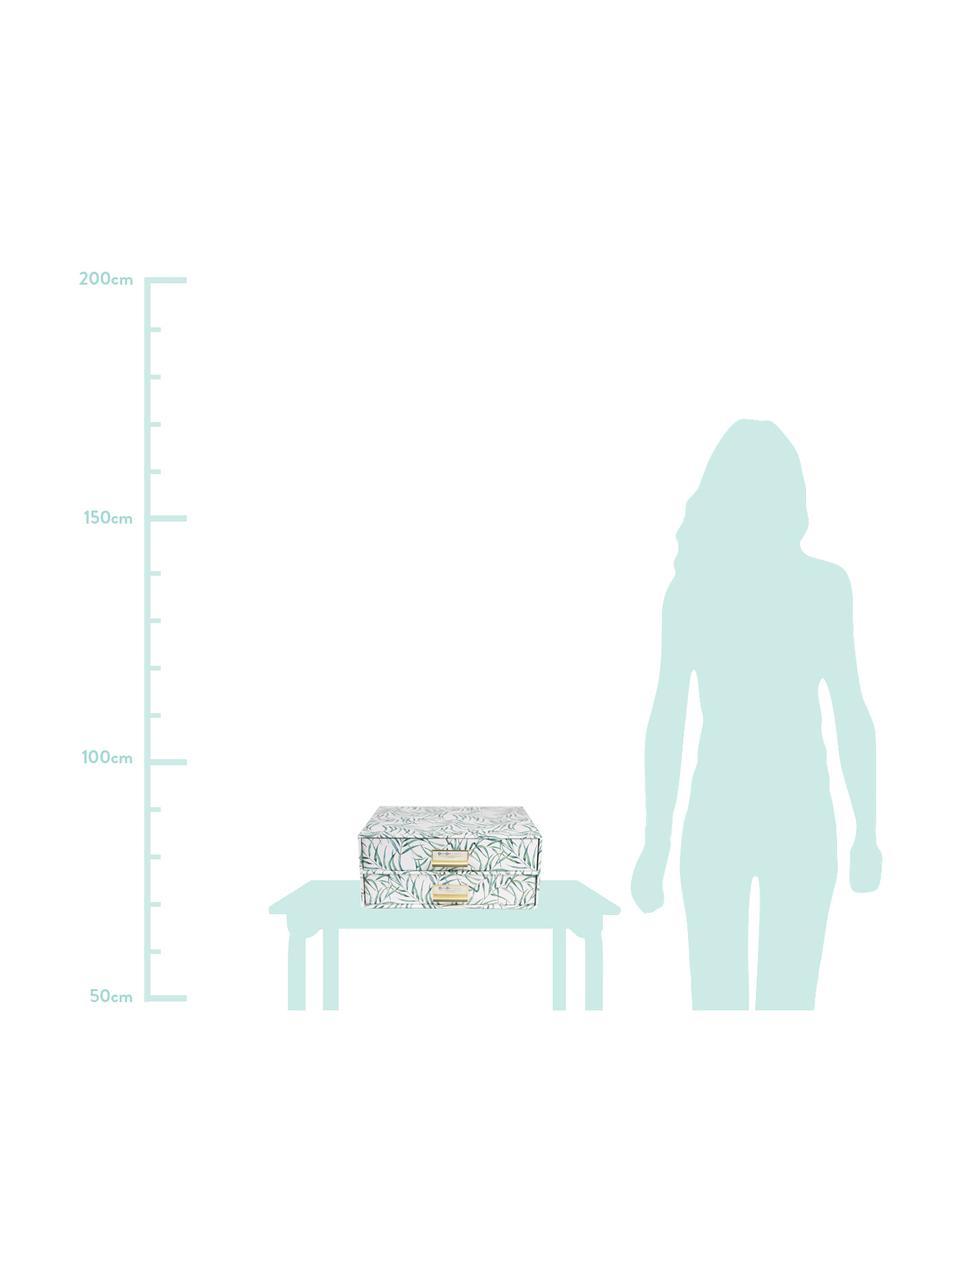 Büro-Organizer Leaf, Organizer: Fester, laminierter Karto, Griff: Metall, Weiß, Grün, 33 x 15 cm